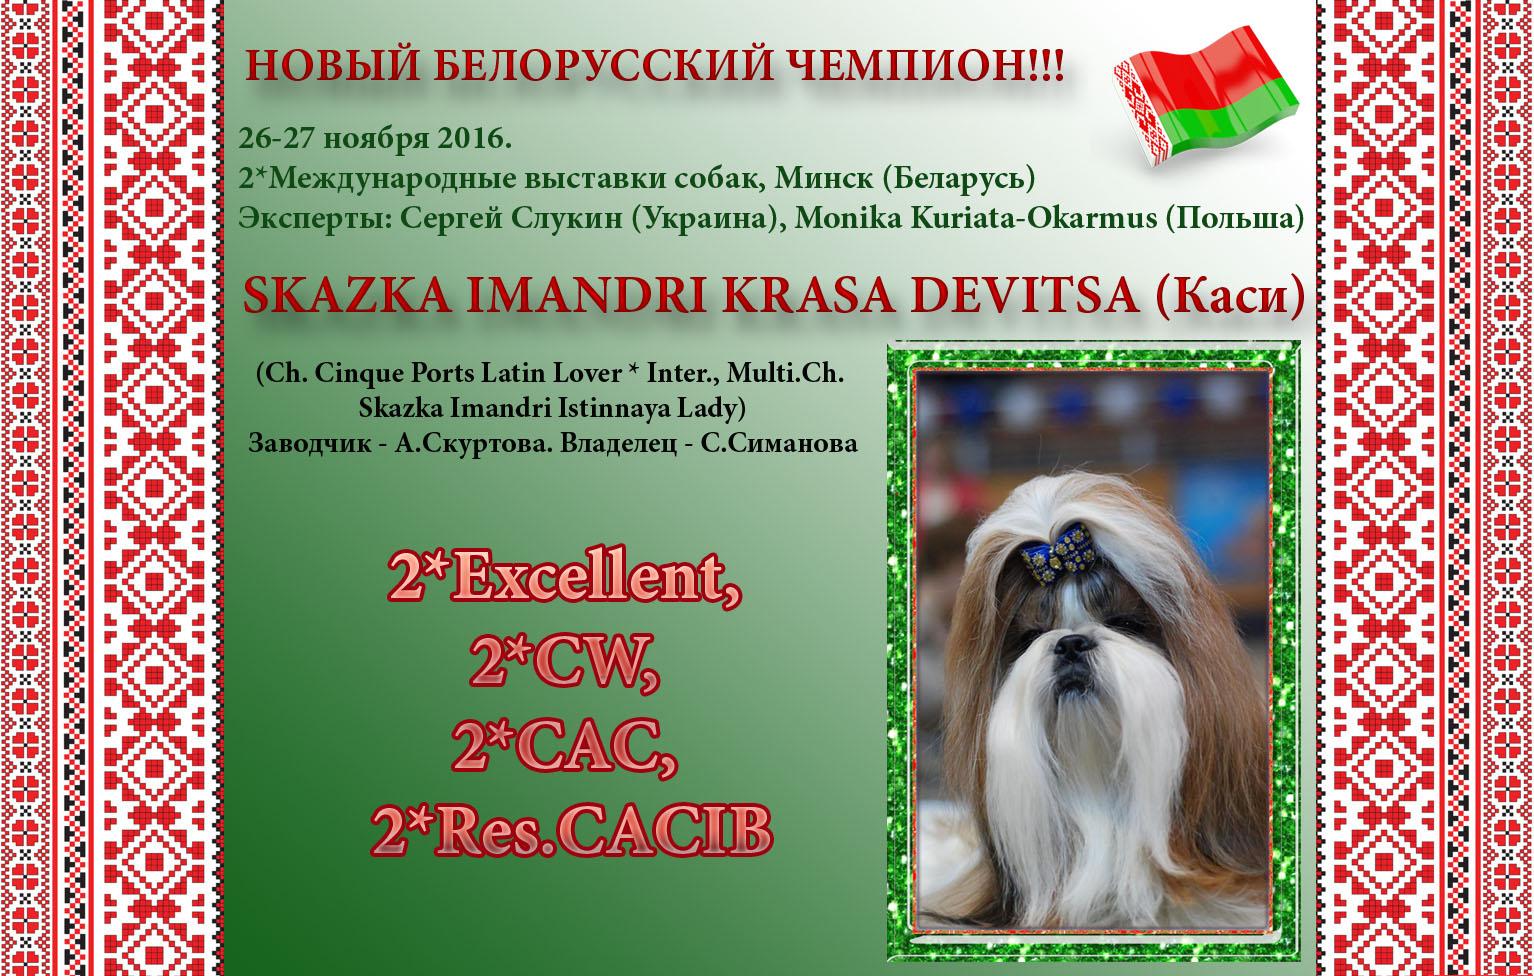 Каси - новый Чемпион Беларуси!